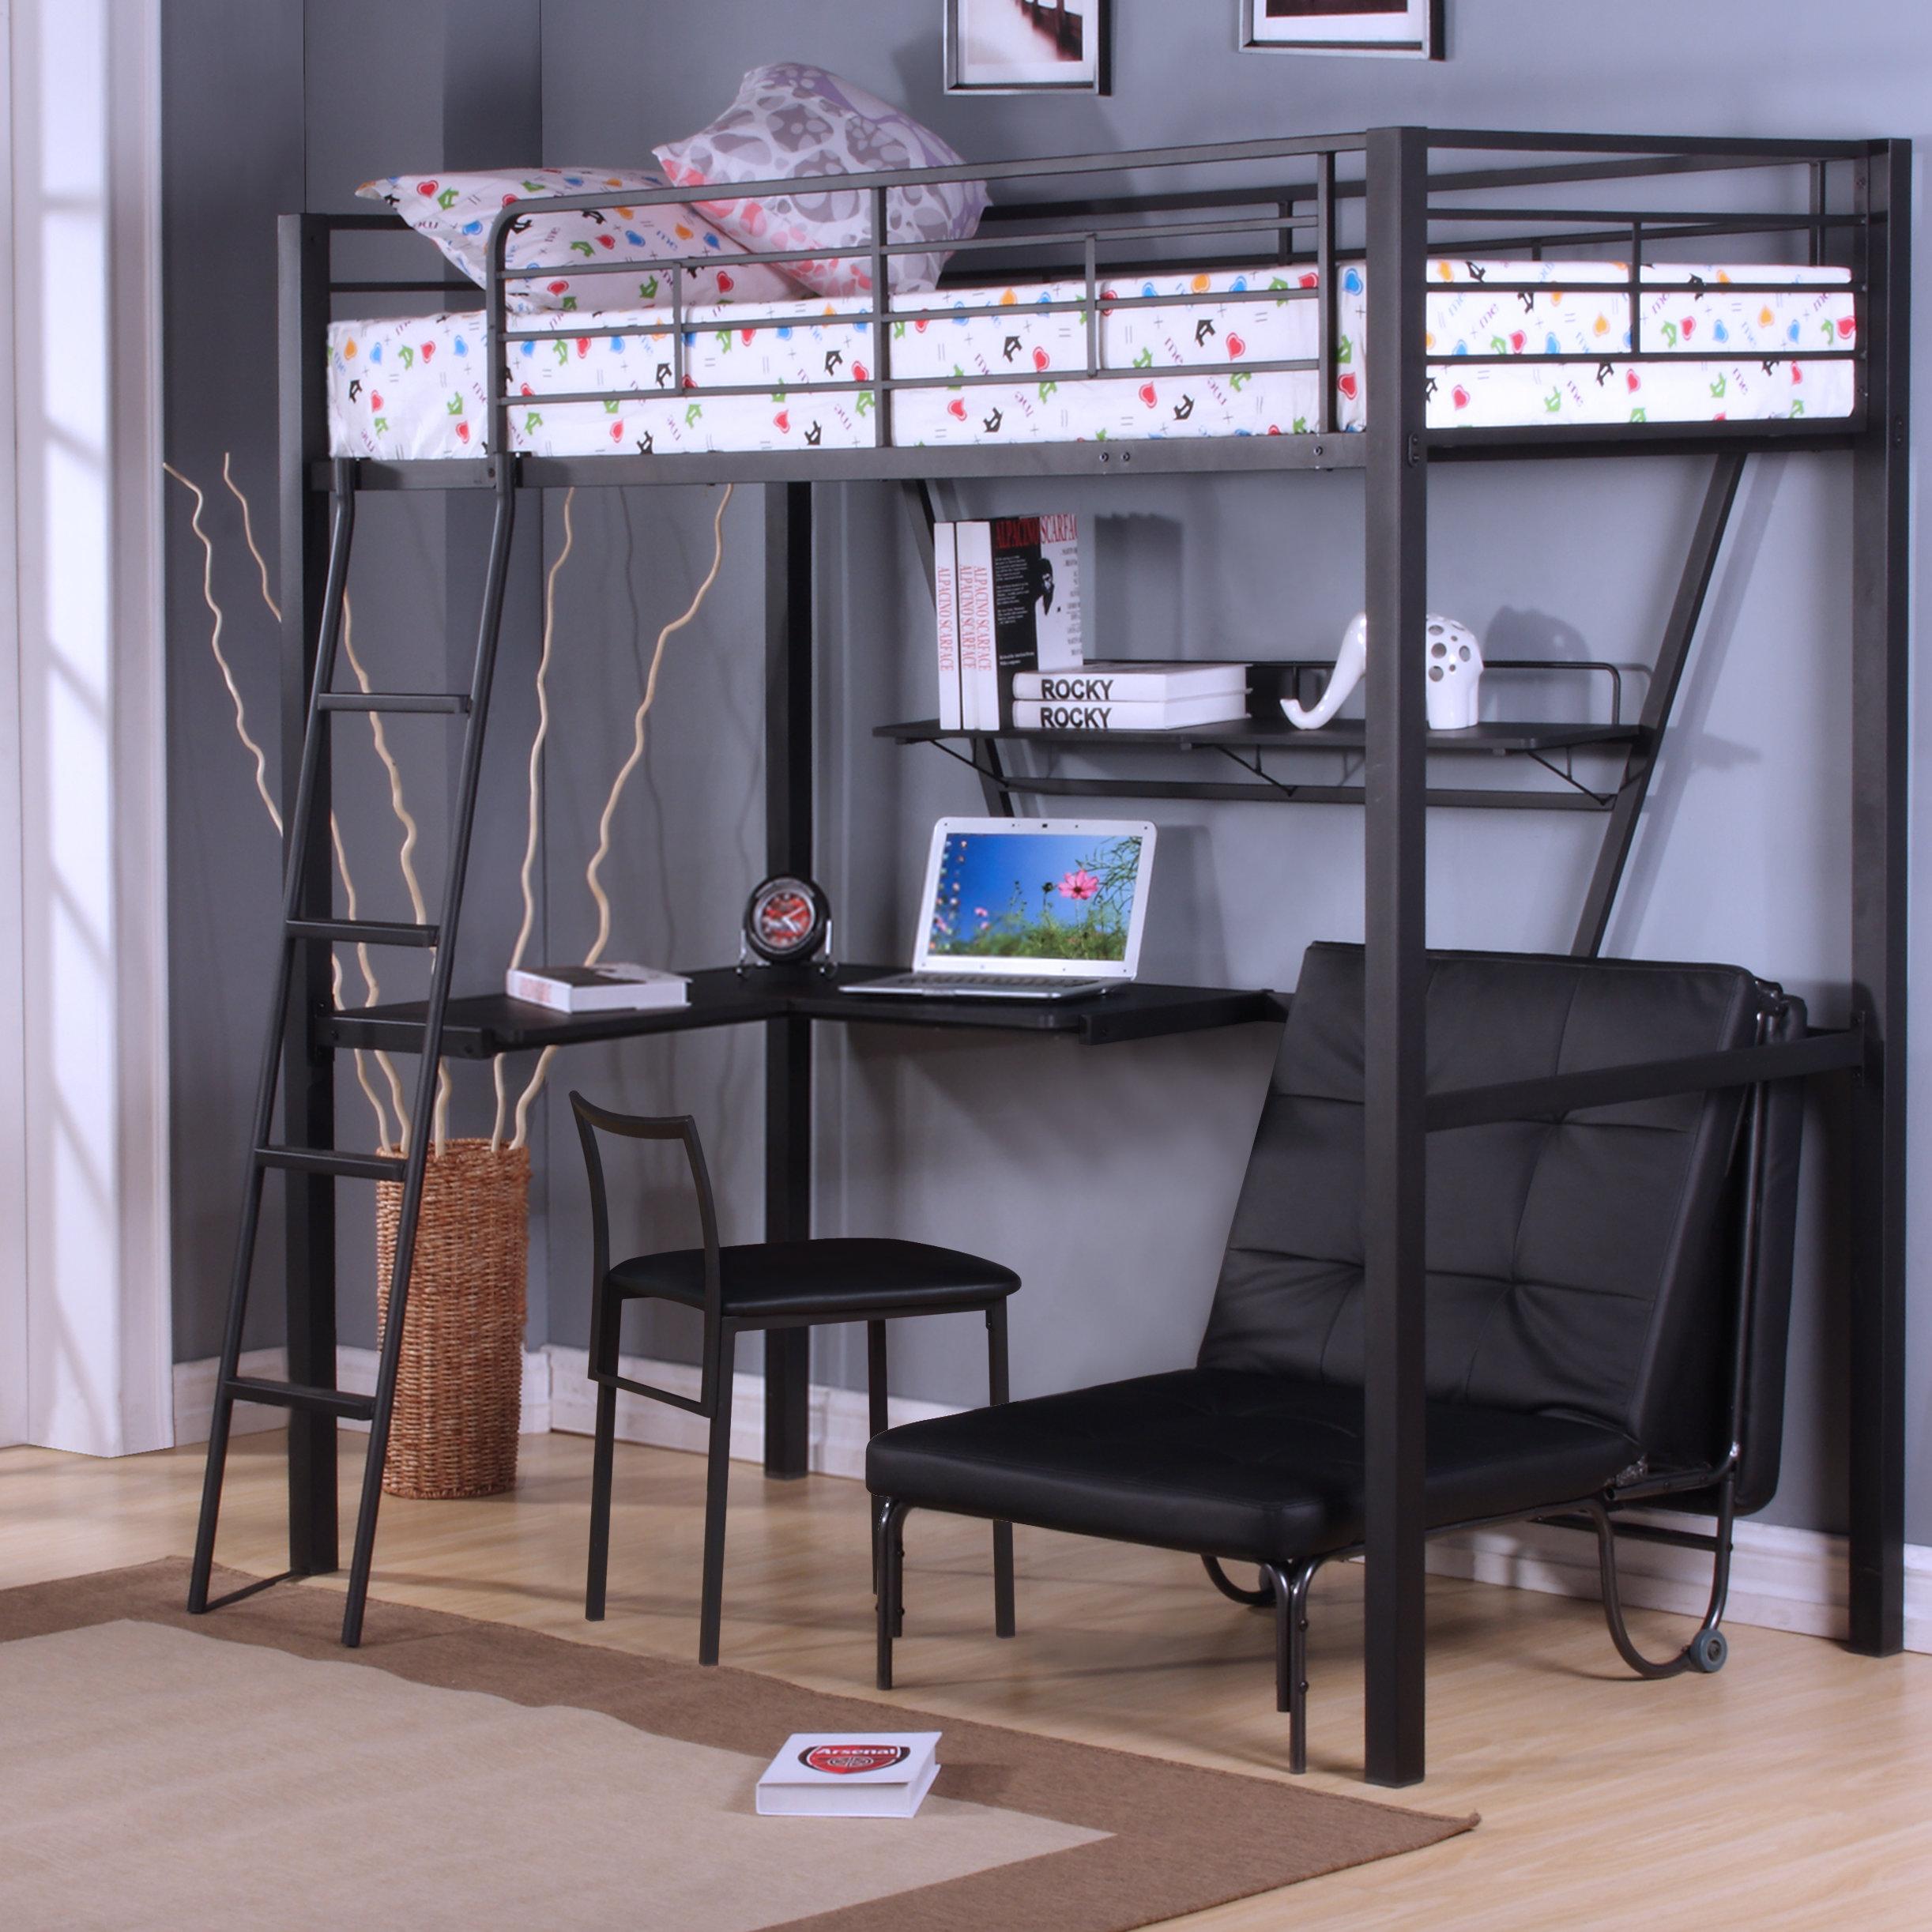 bunk beds with desk acme furniture senon loft bed with desk u0026 reviews | wayfair GWKEDUN